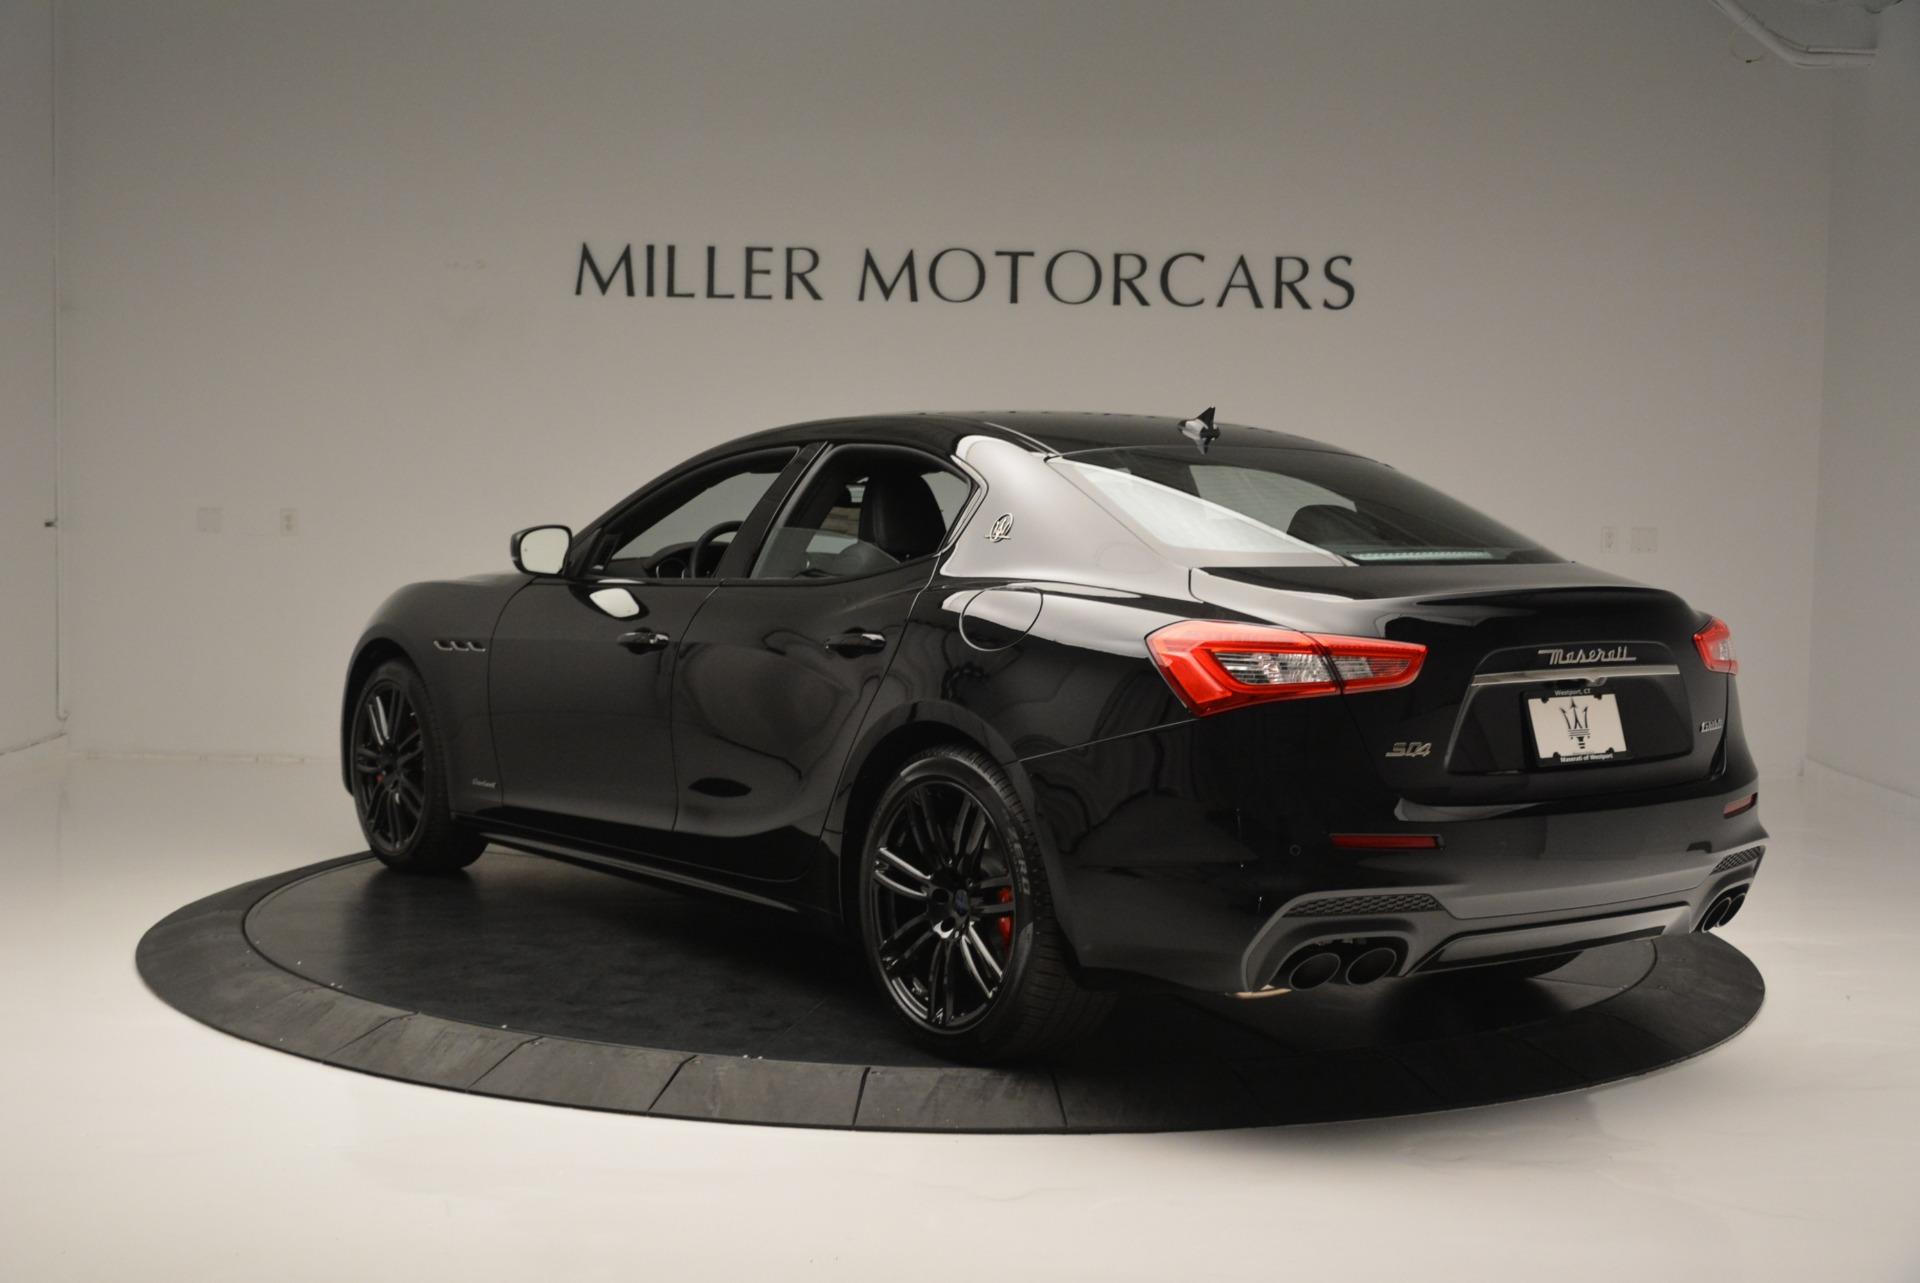 New 2018 Maserati Ghibli SQ4 GranSport Nerissimo For Sale In Westport, CT 2278_p5